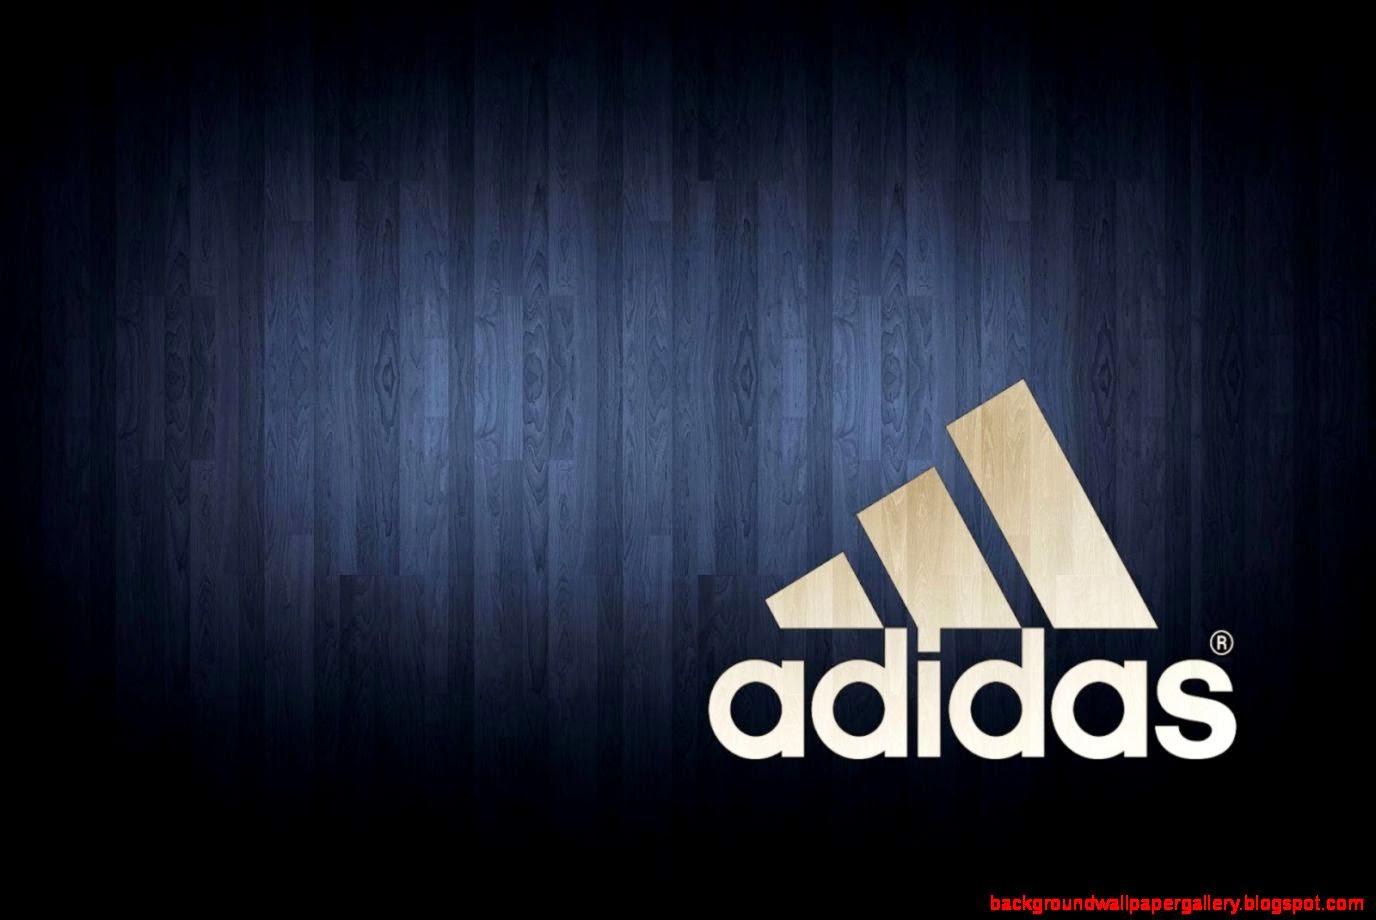 Adidas Logo Wallpapers Hd Desktop Background Wallpaper 1376x920